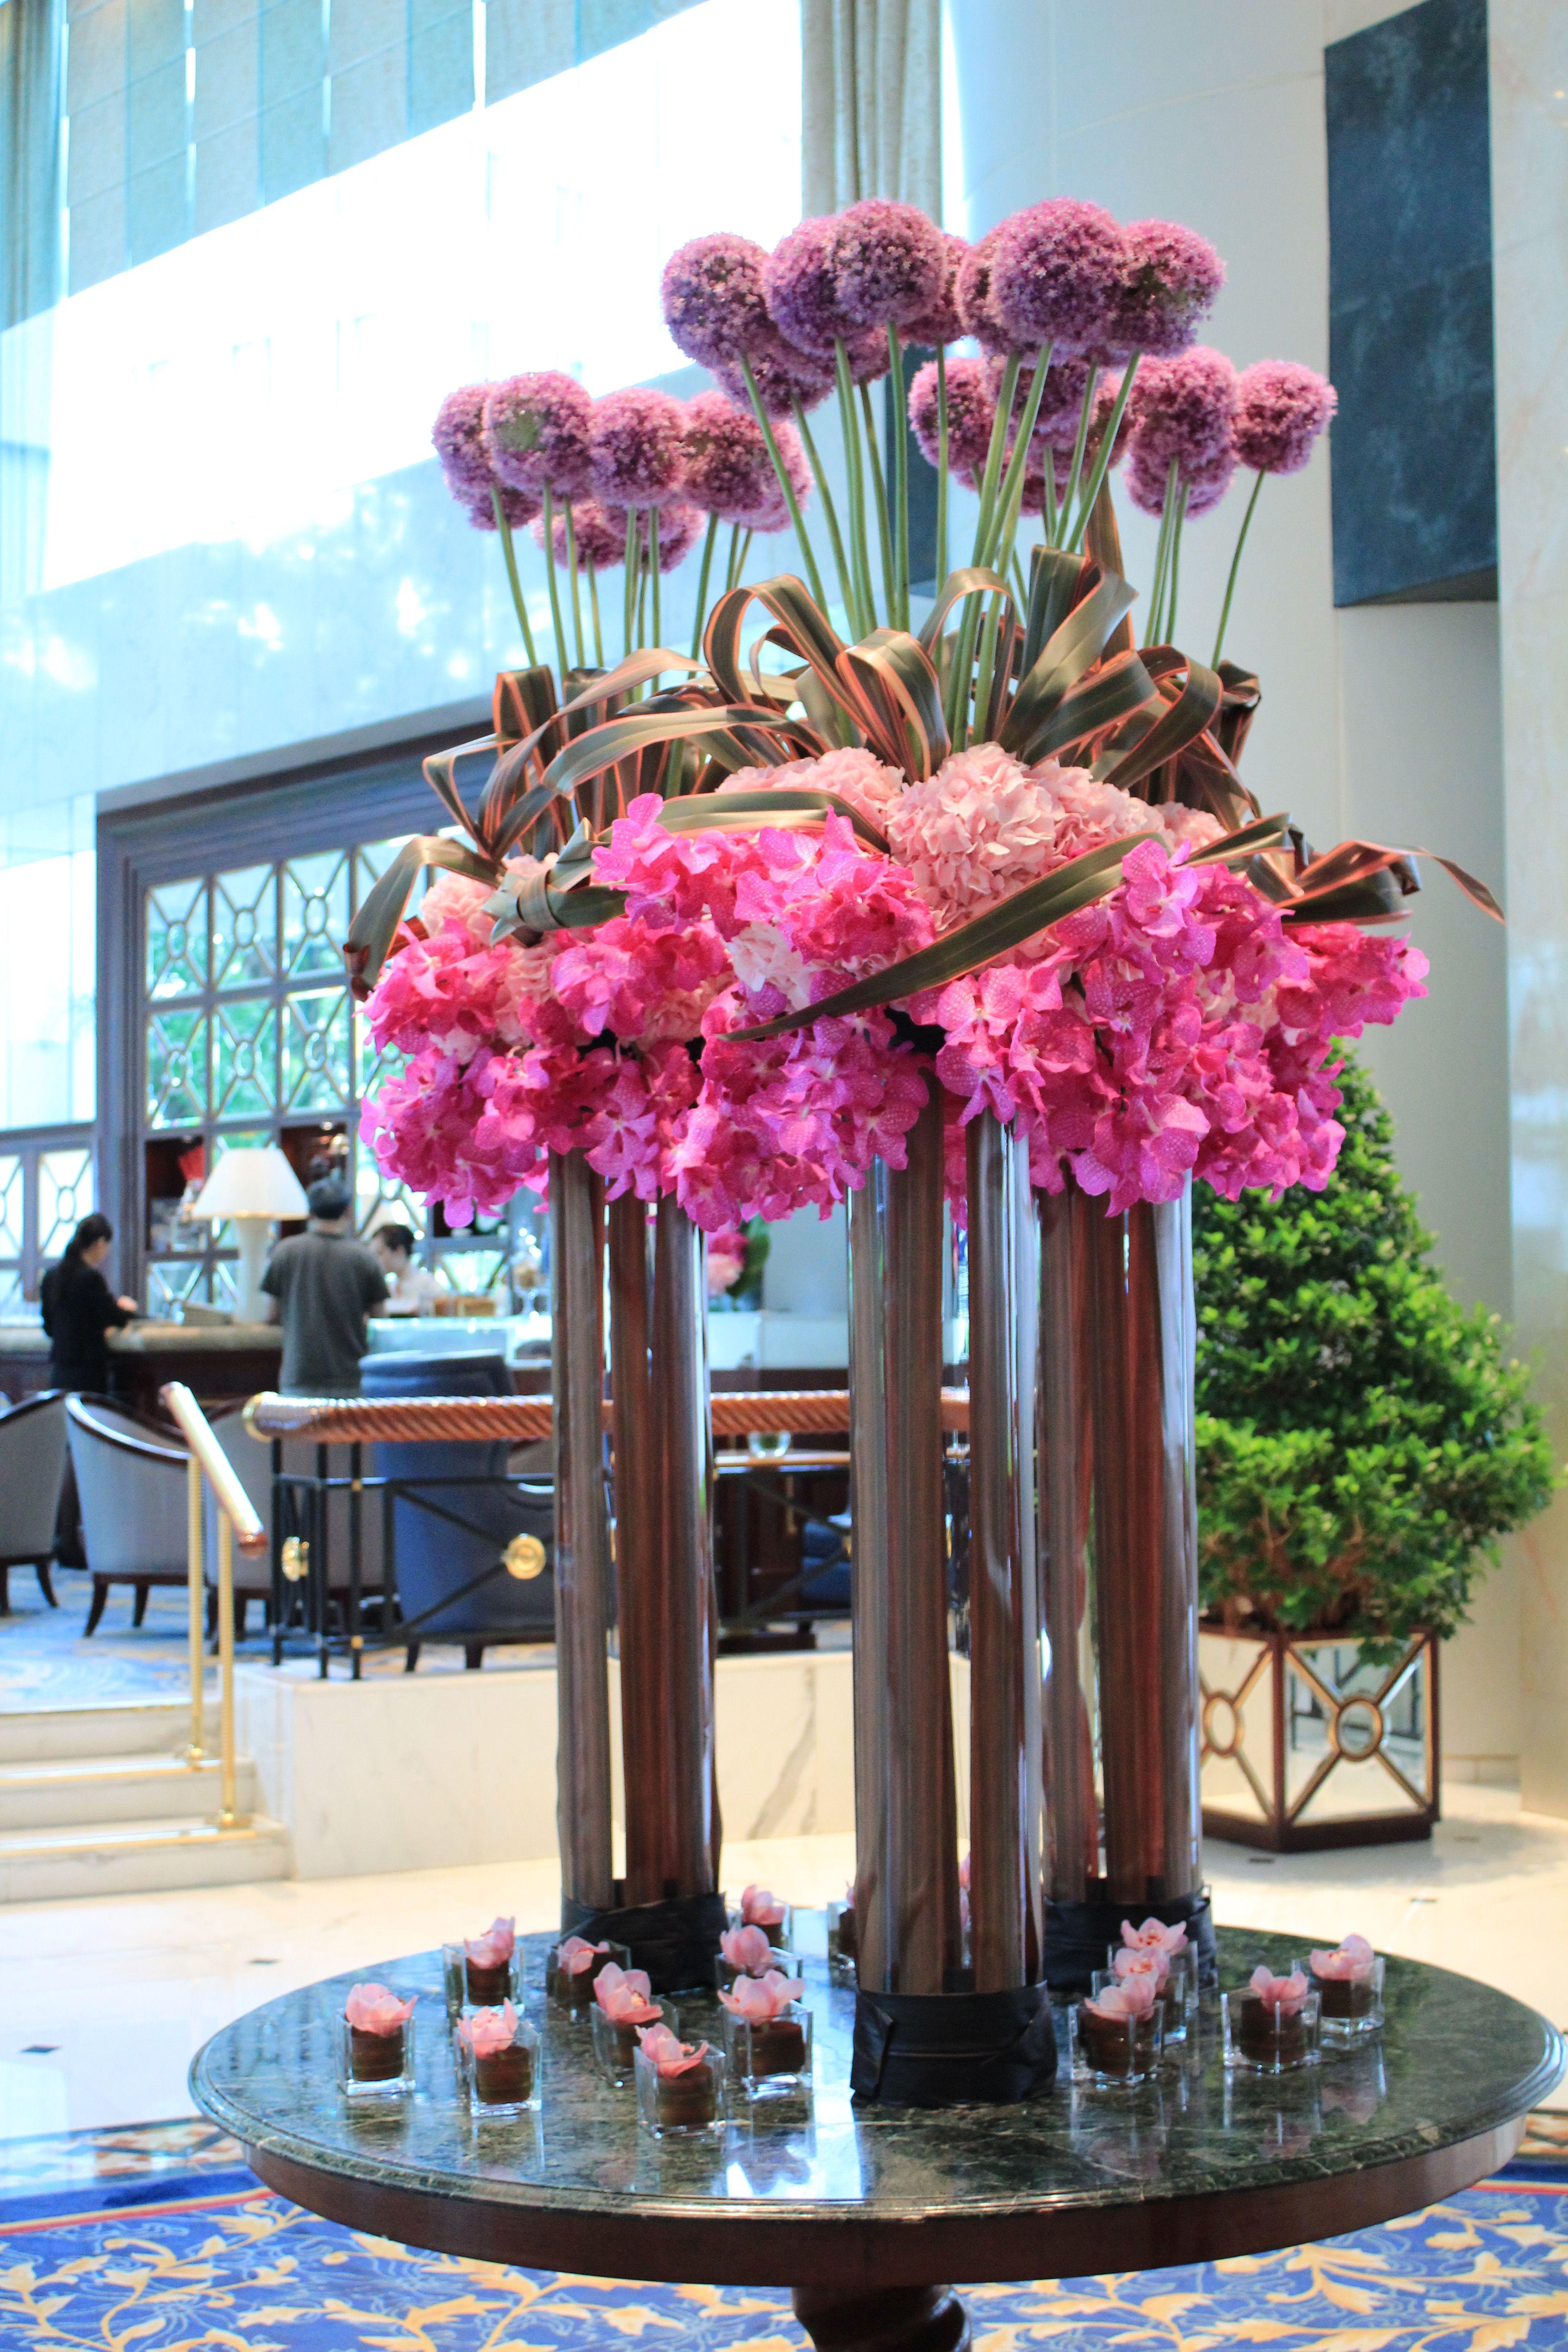 Harmonious Flower Arrangement Brightening Up Our Lobby Large Flower Arrangements Modern Flower Arrangements Hotel Flower Arrangements